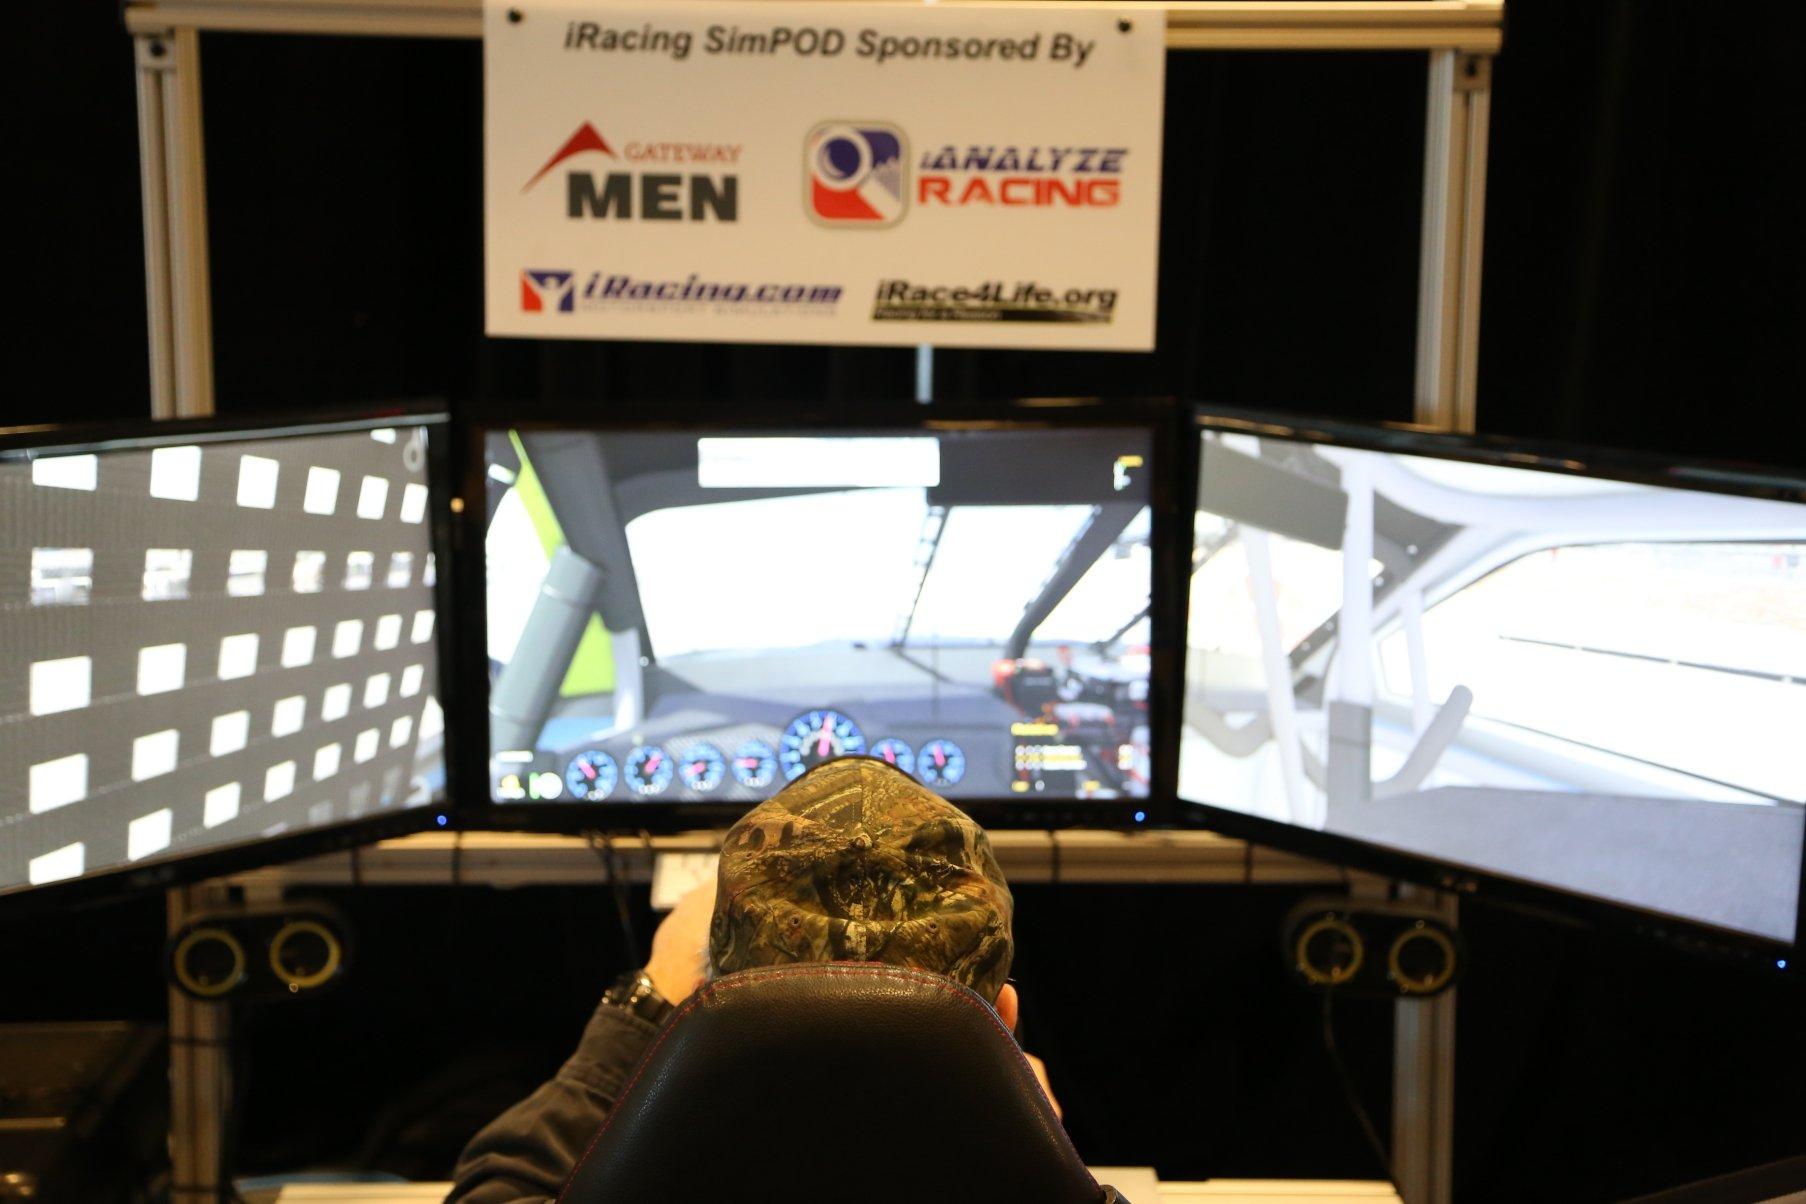 2015 iRace4Life Sim Racing Seminar Recap